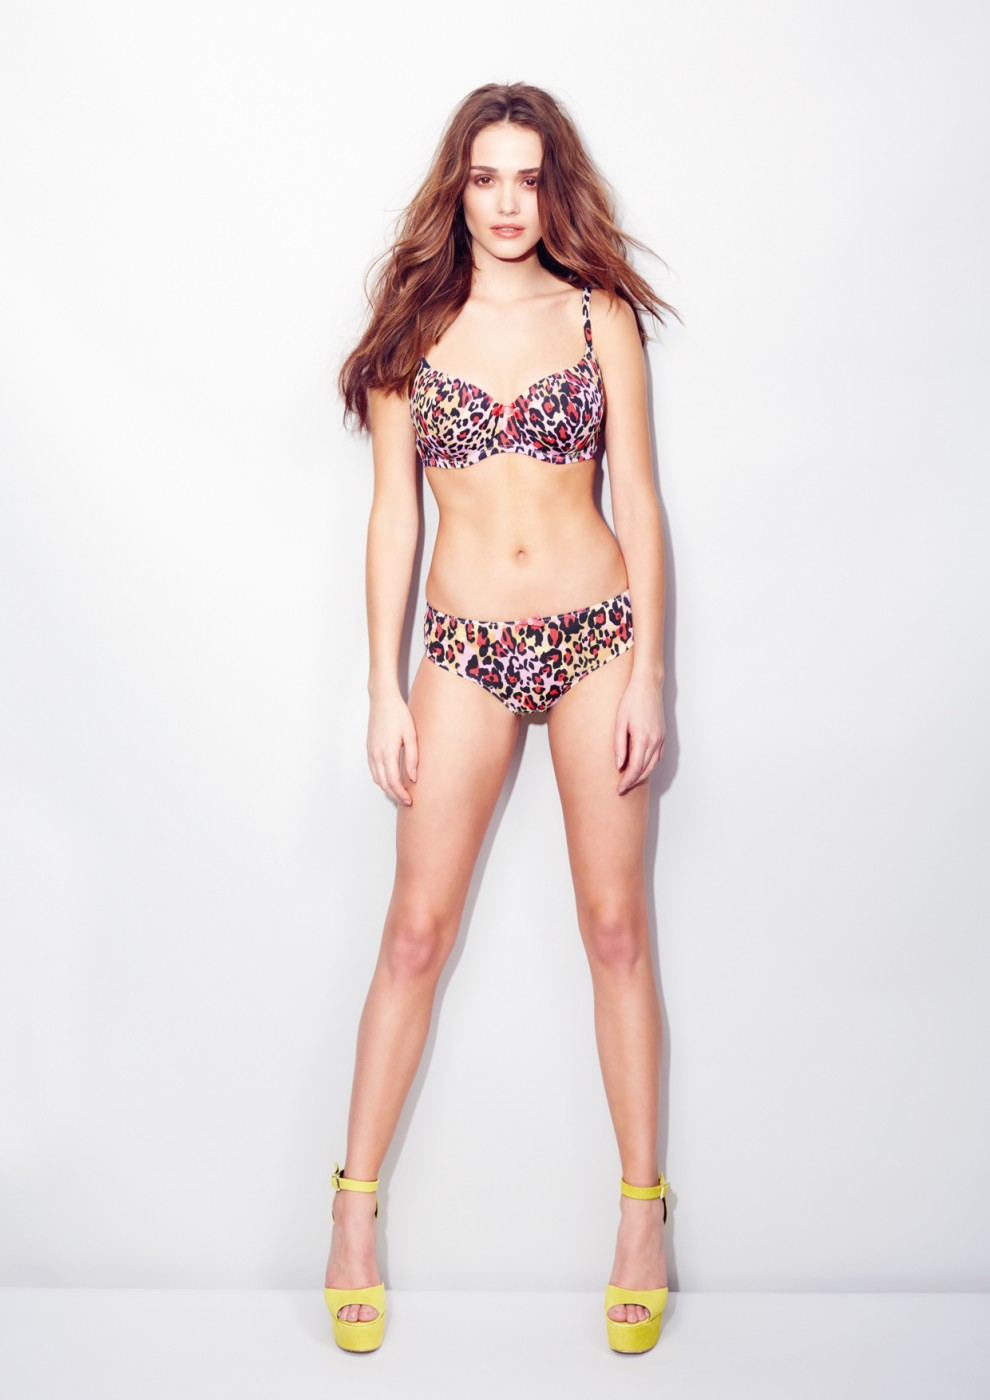 Amber Elkins Martinez